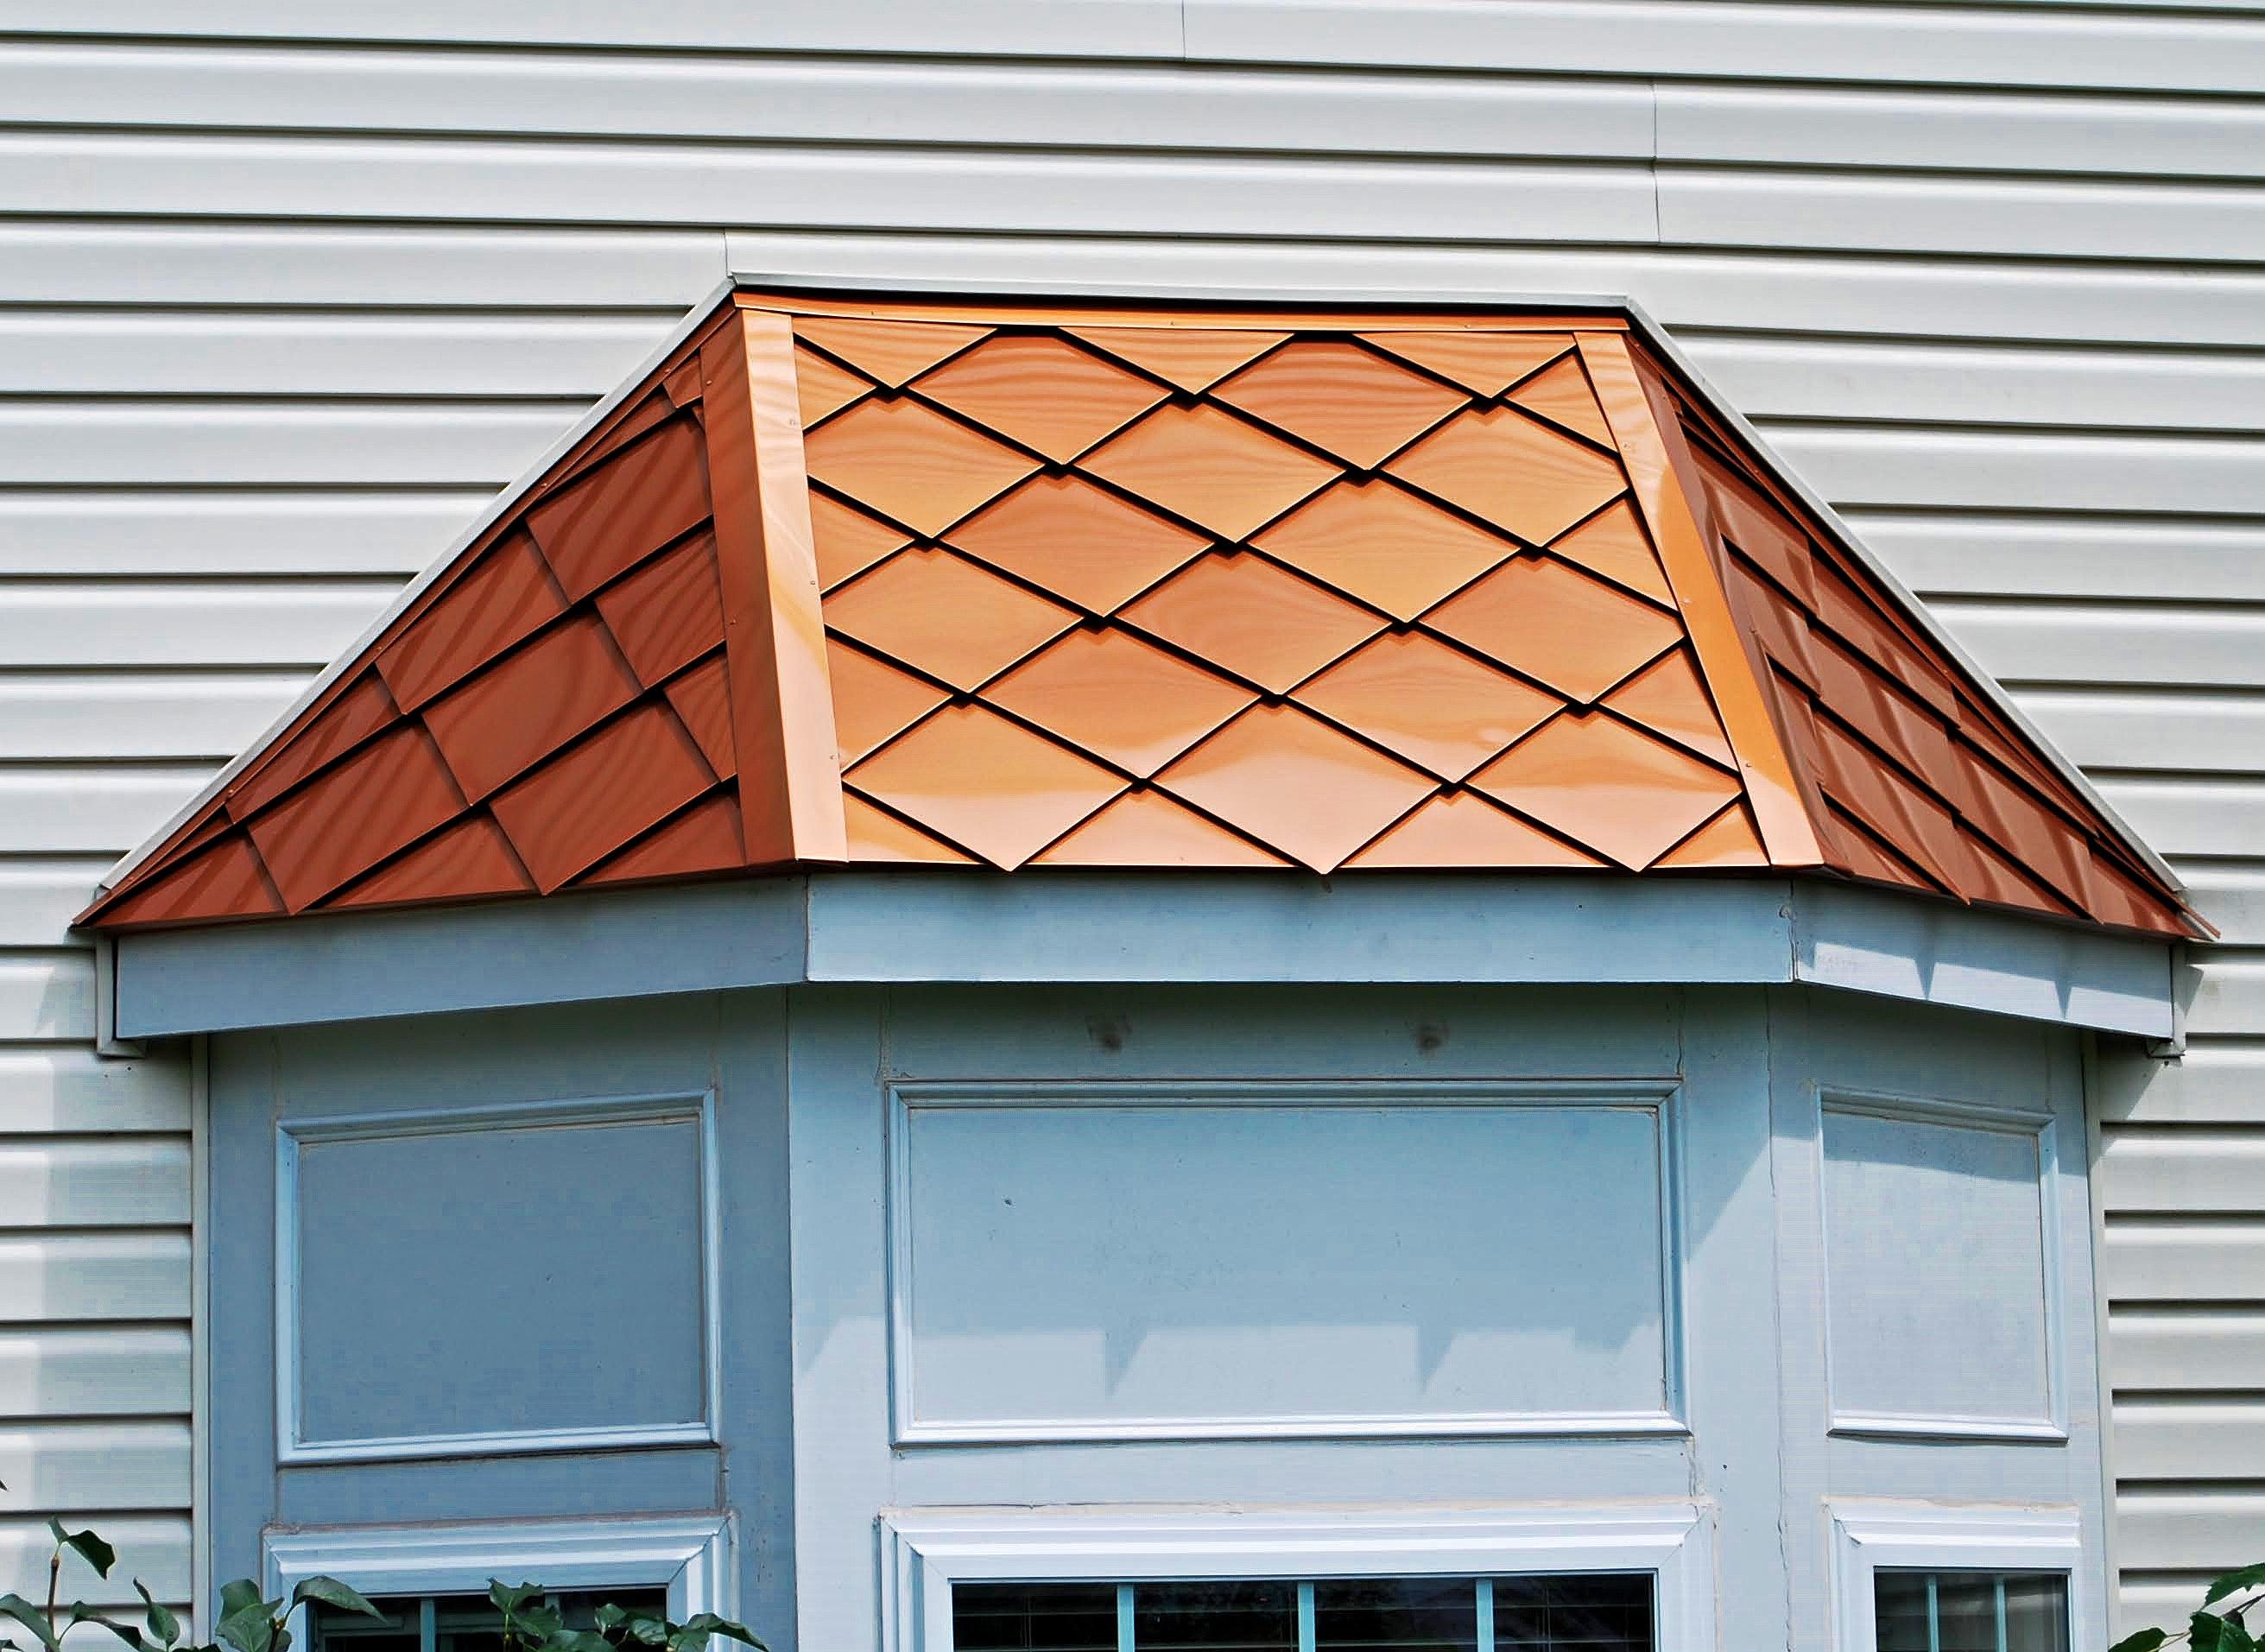 Handmade Aluminum Diamond Tile Roofing.